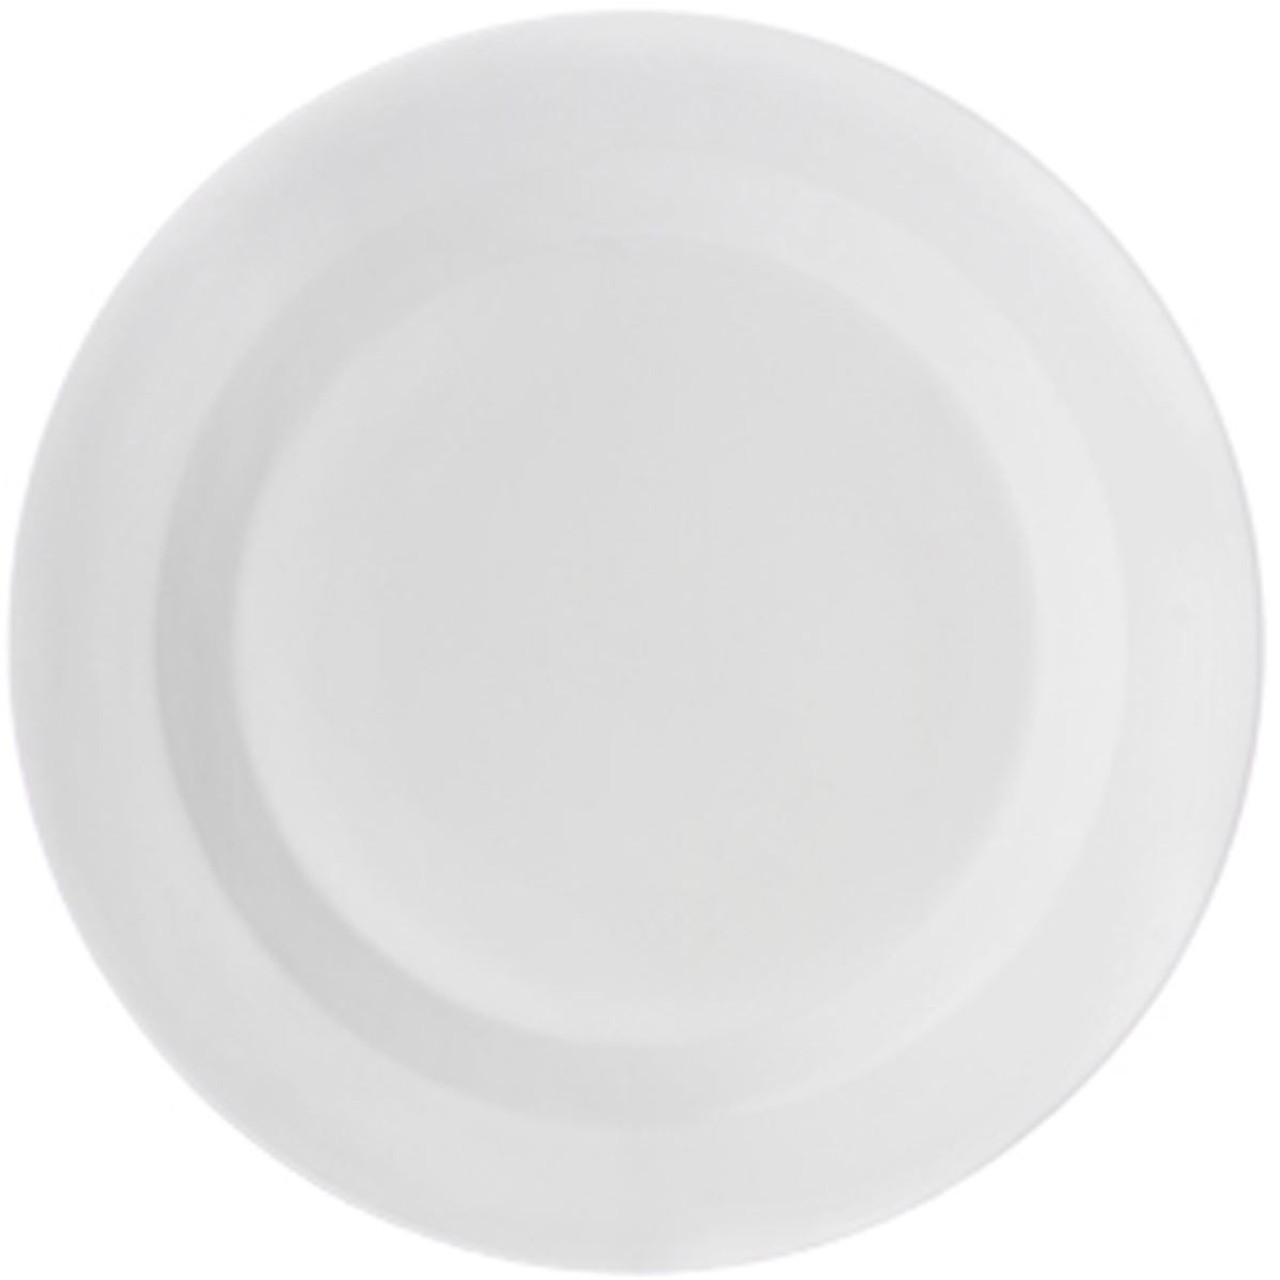 Denby James Martin Everyday Salad Plate